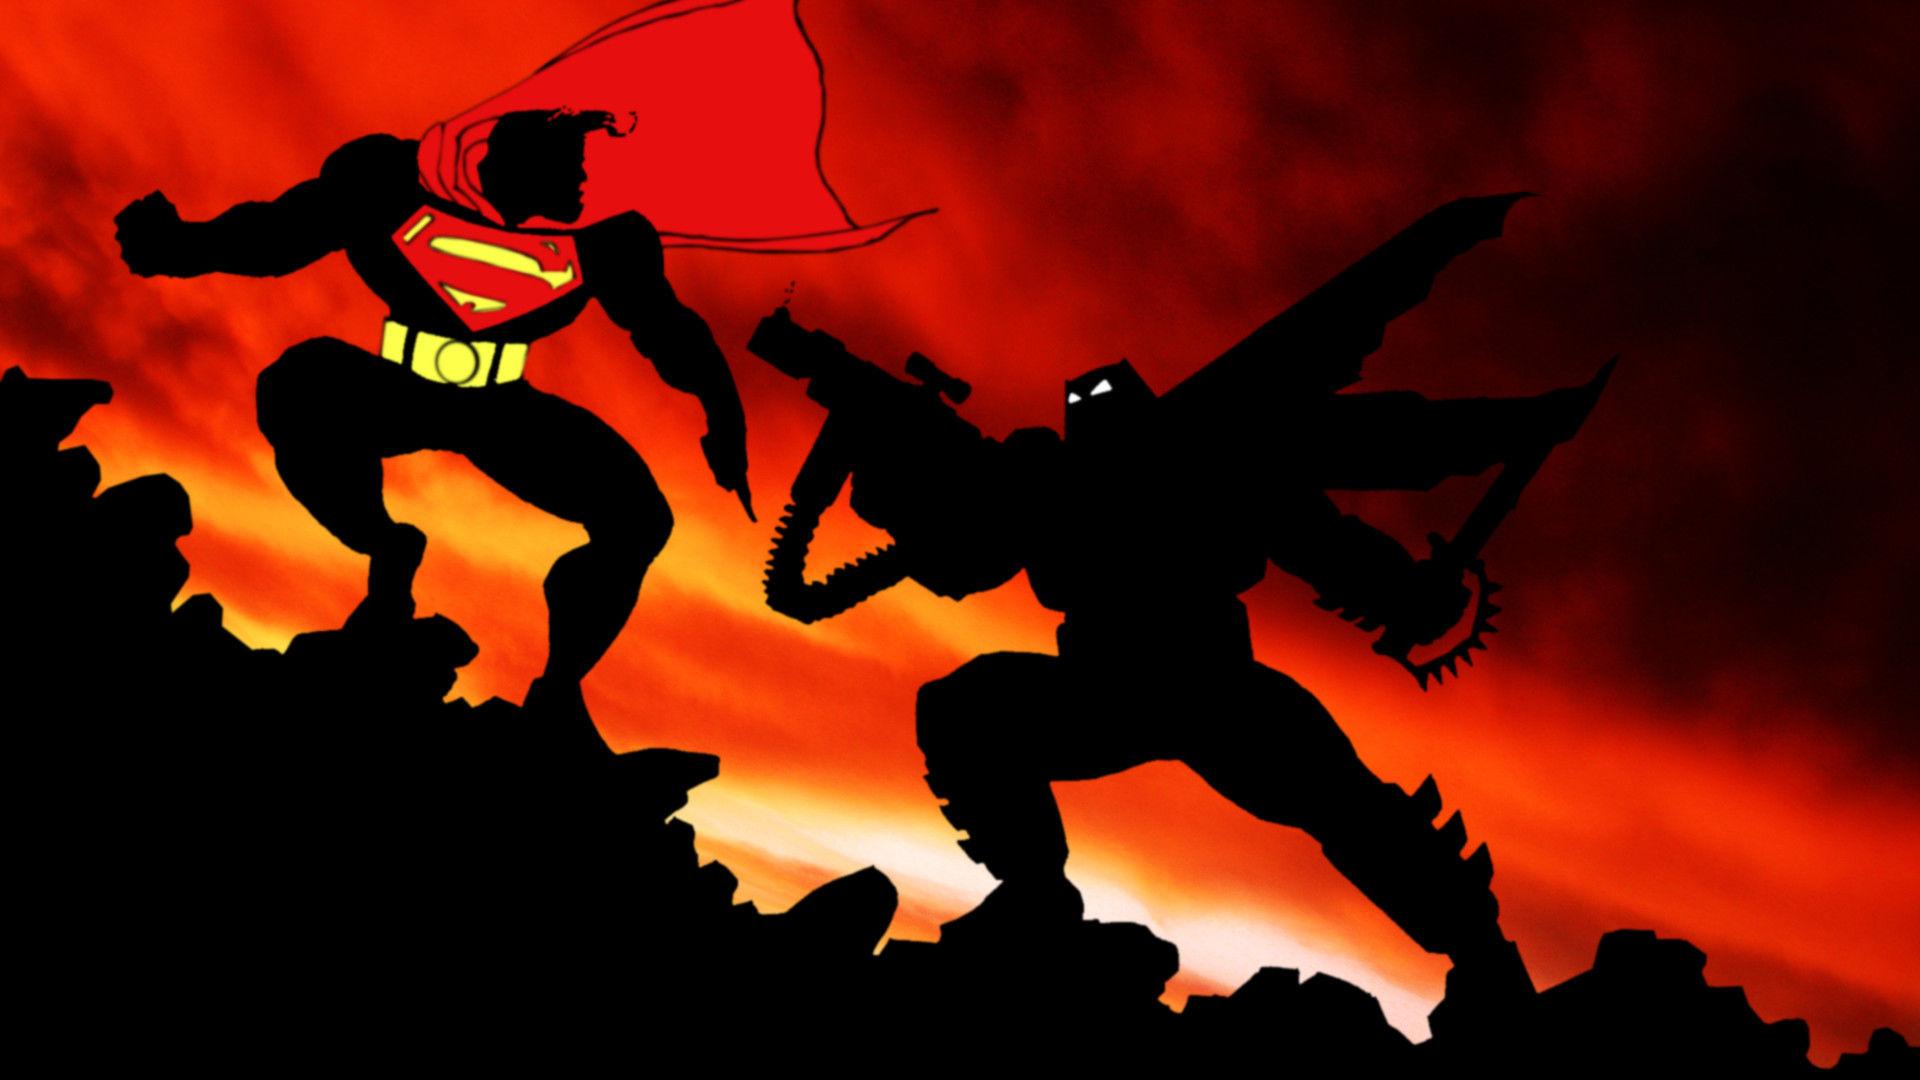 01-batman-vs-superman-in-the-dark-knight-returns-comic.jpg